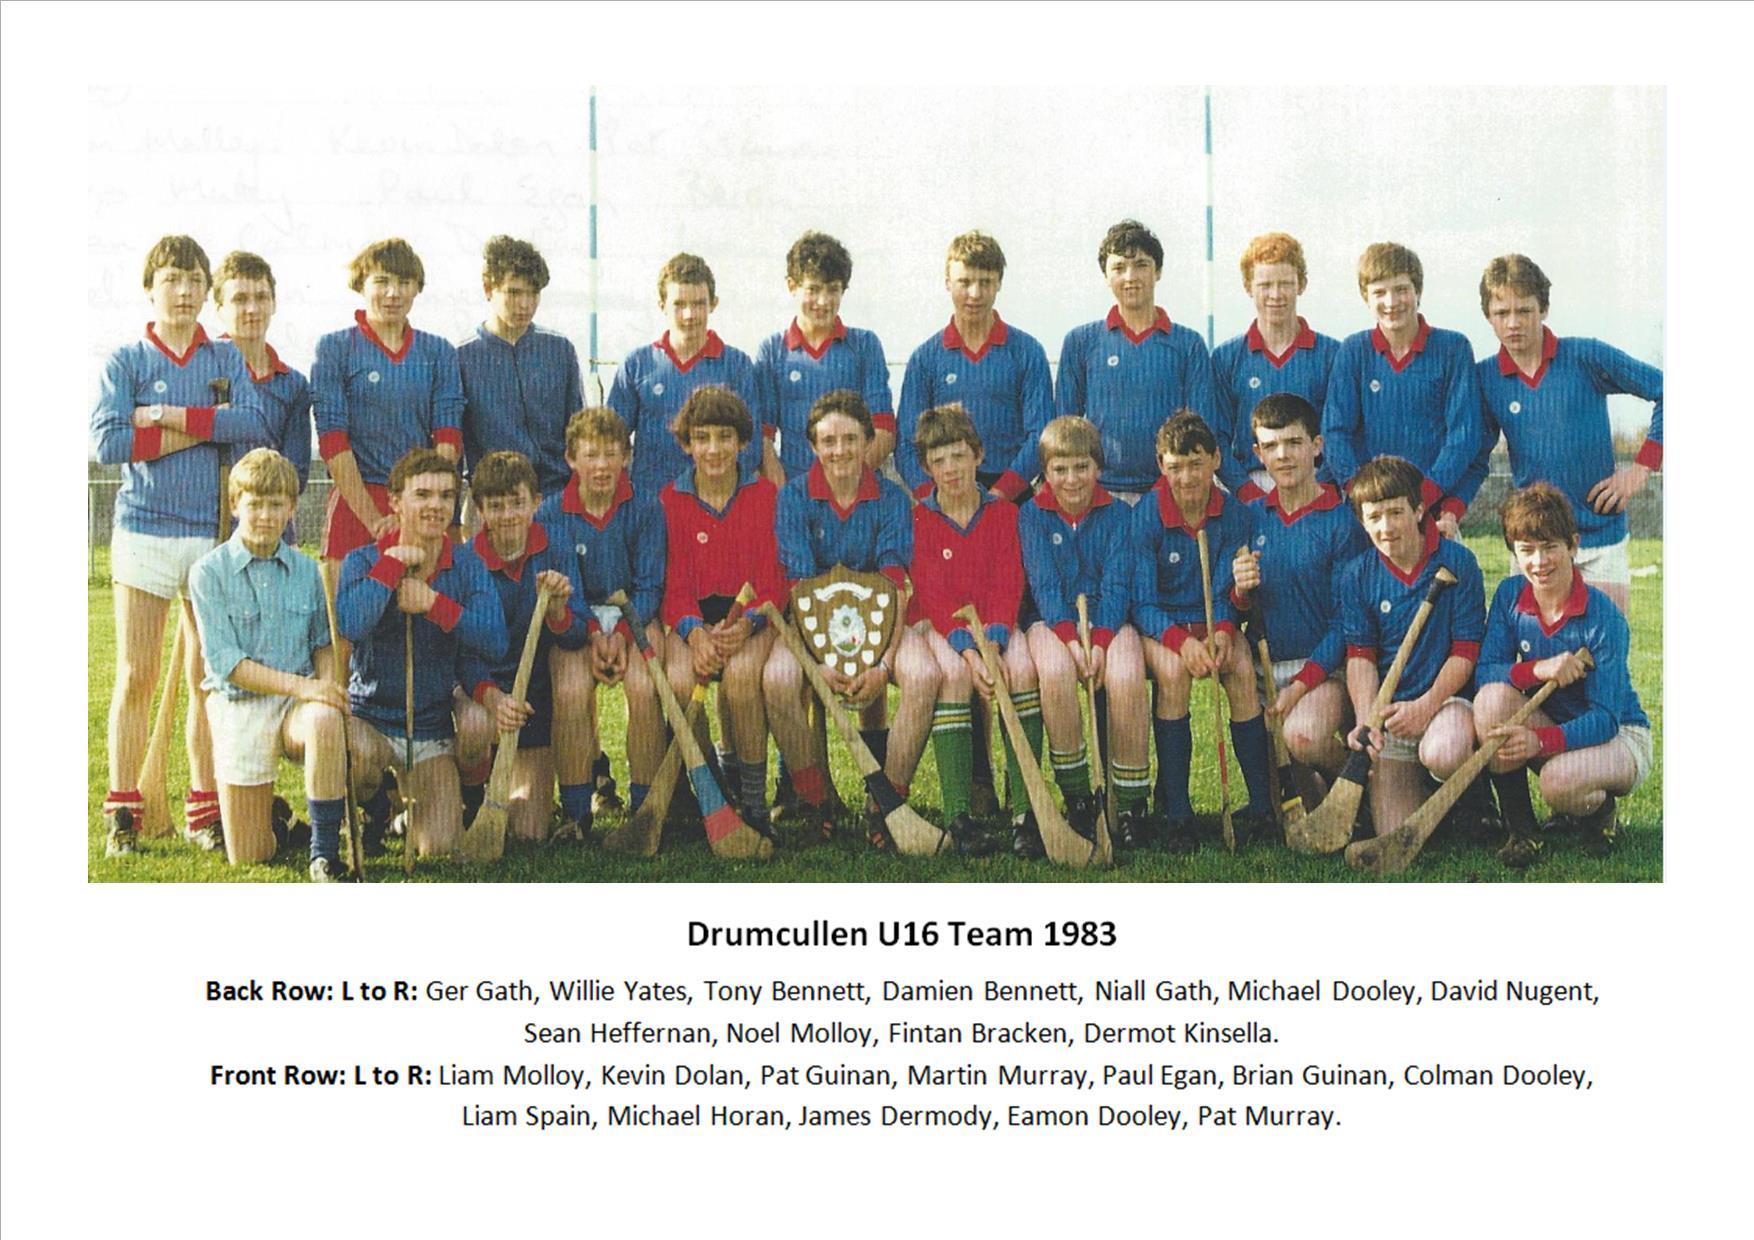 Drumcullen U16 Team 1983